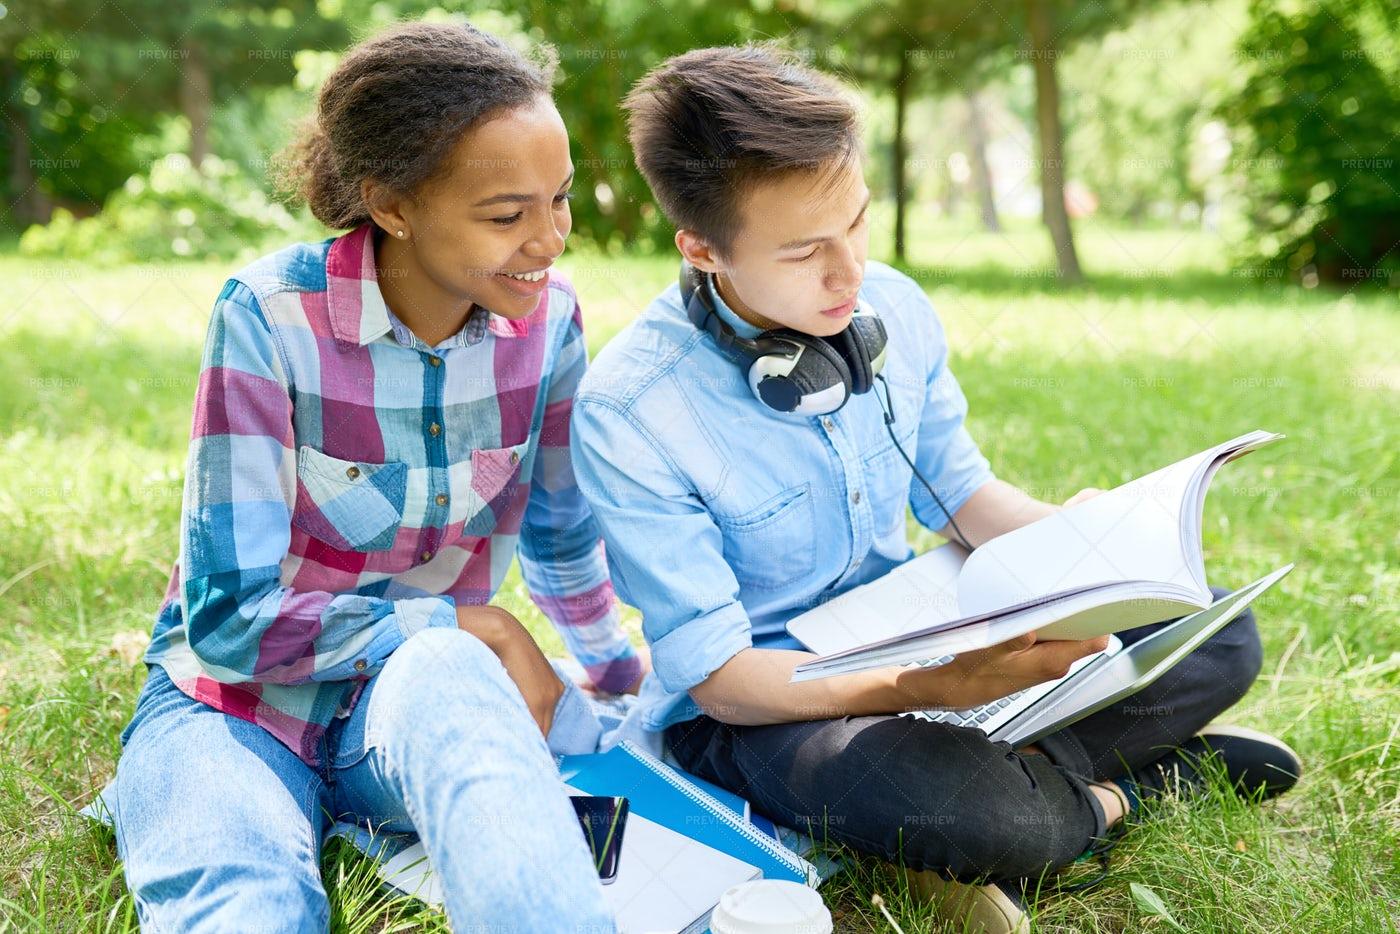 Couple Of Students Doing Homework...: Stock Photos